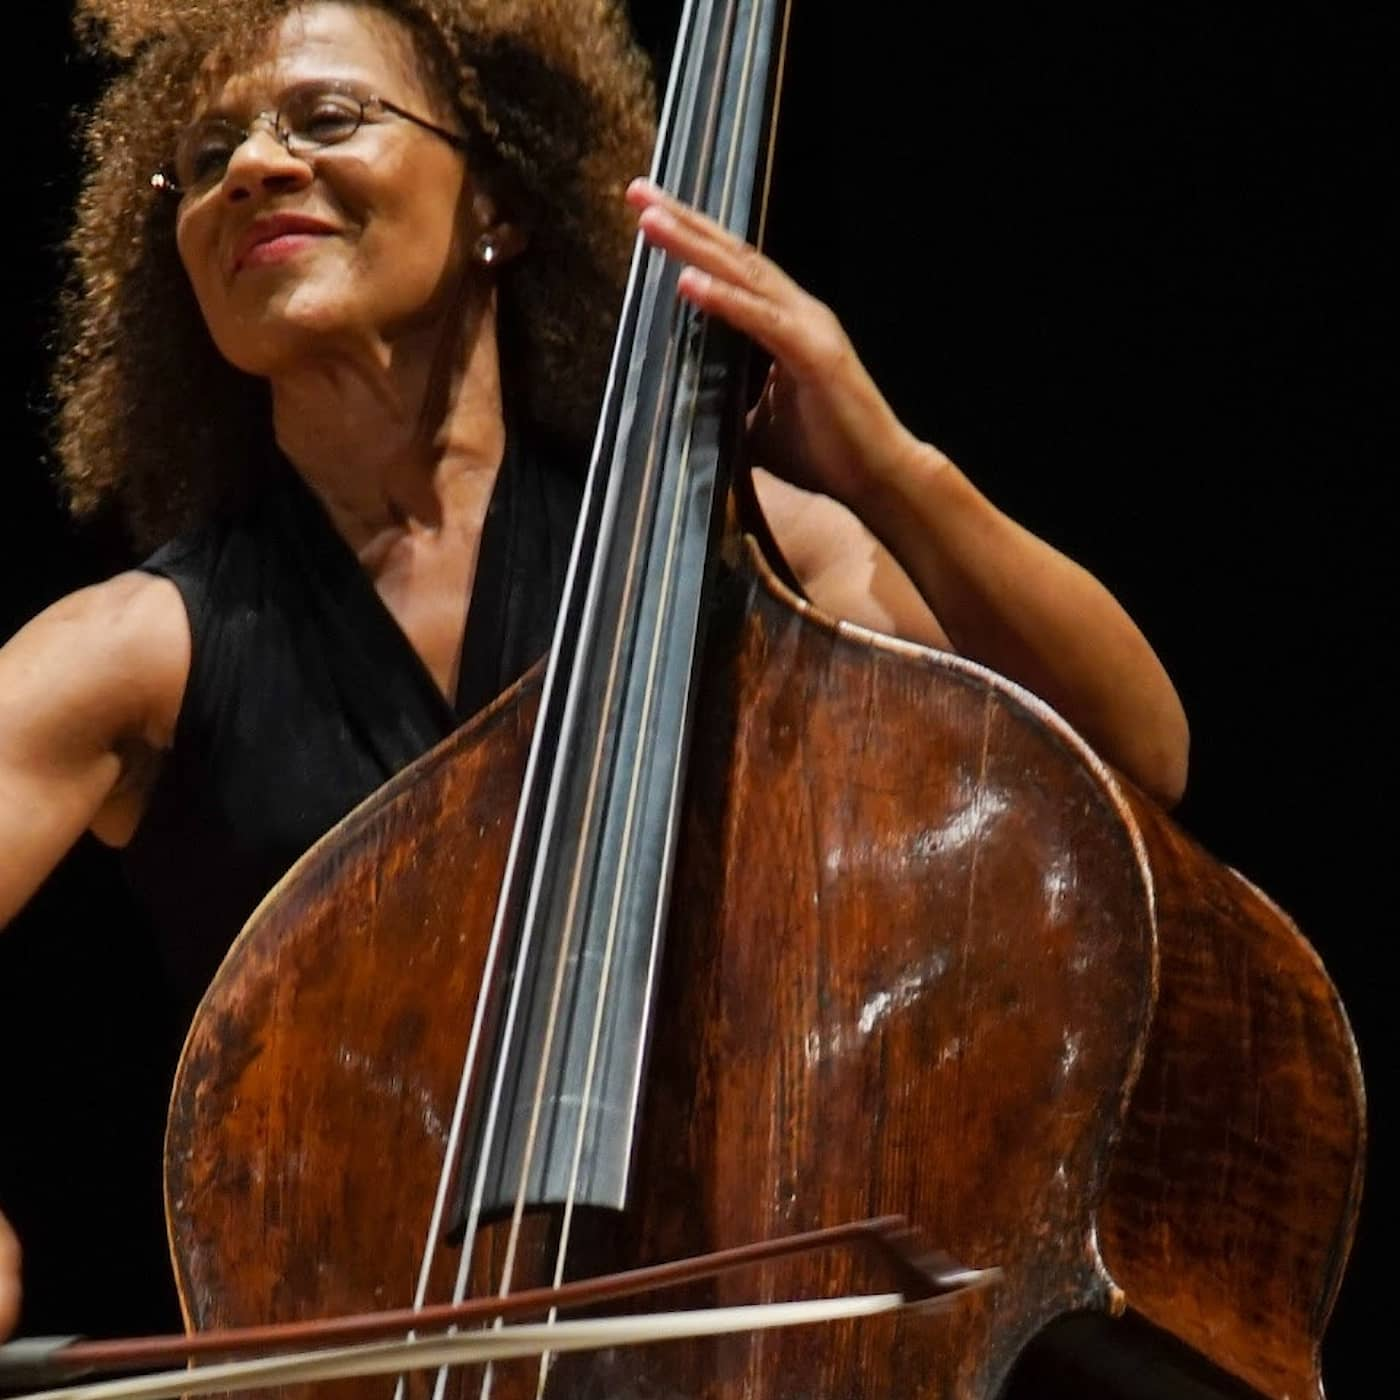 Chi-chi Nwanoku, brittisk olympiasprinter, skadade sig och bildade unik orkester